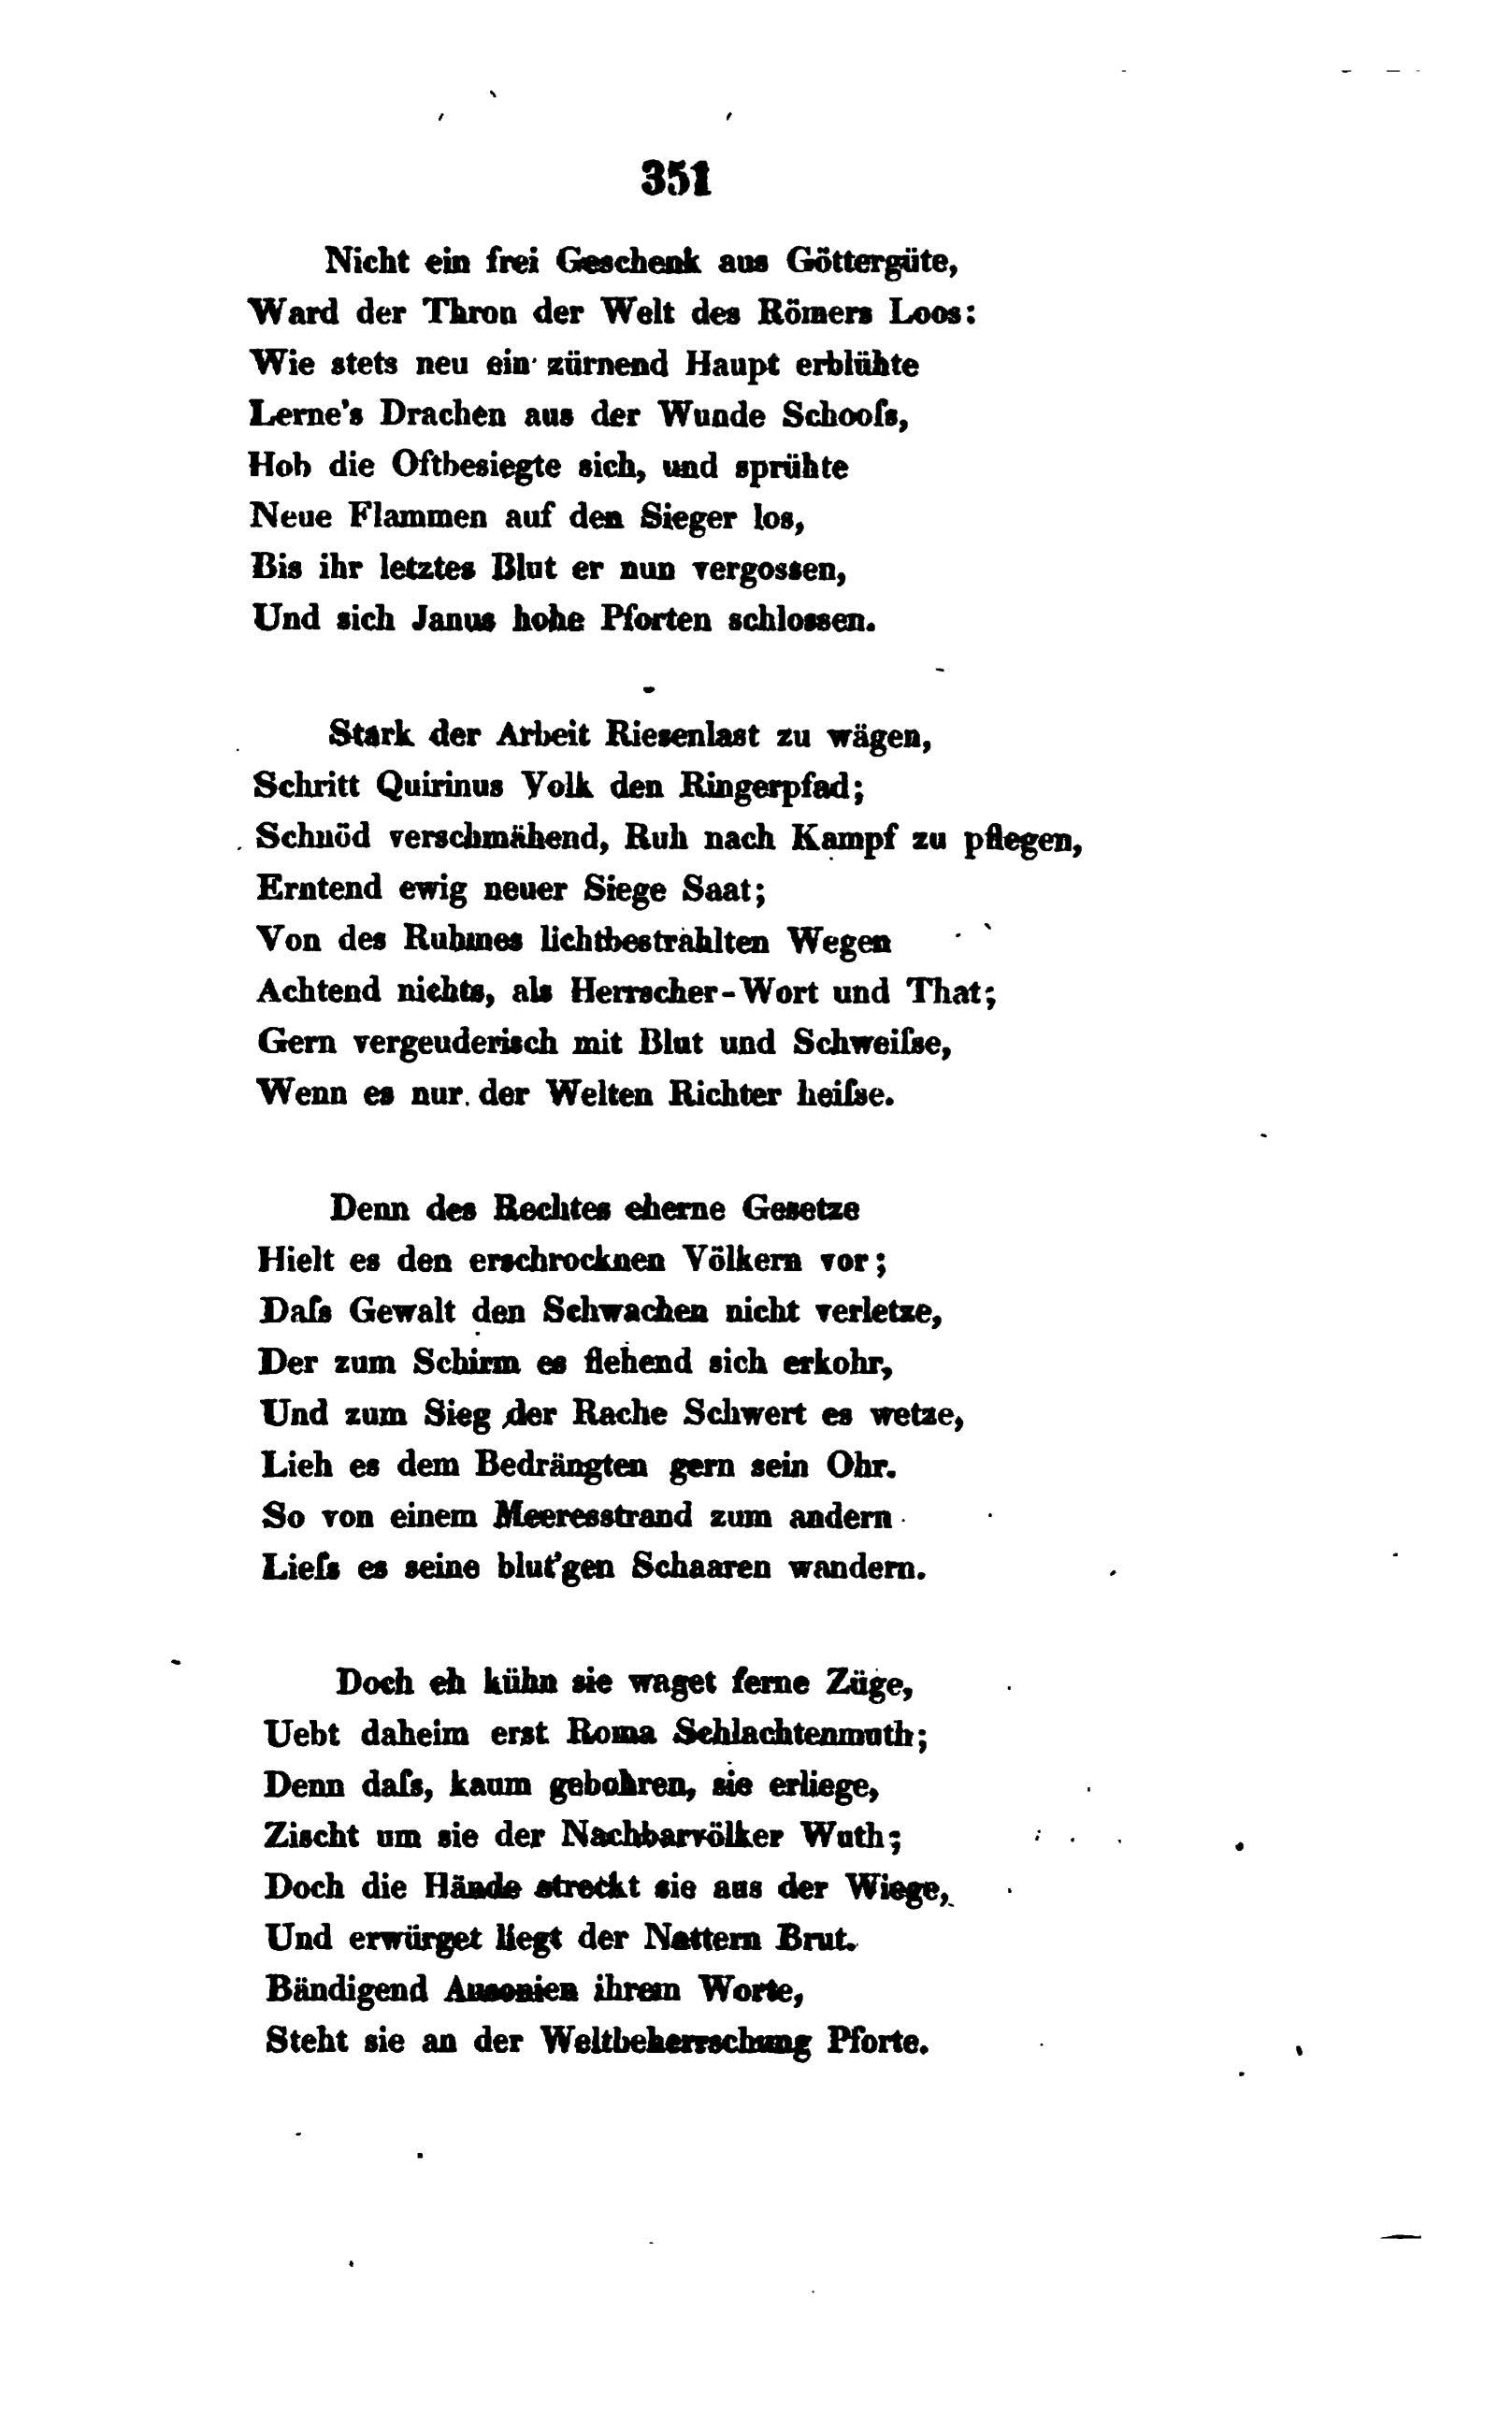 File:Gesammelte Werke (Humboldt W) V1 356.jpg - Wikimedia Commons